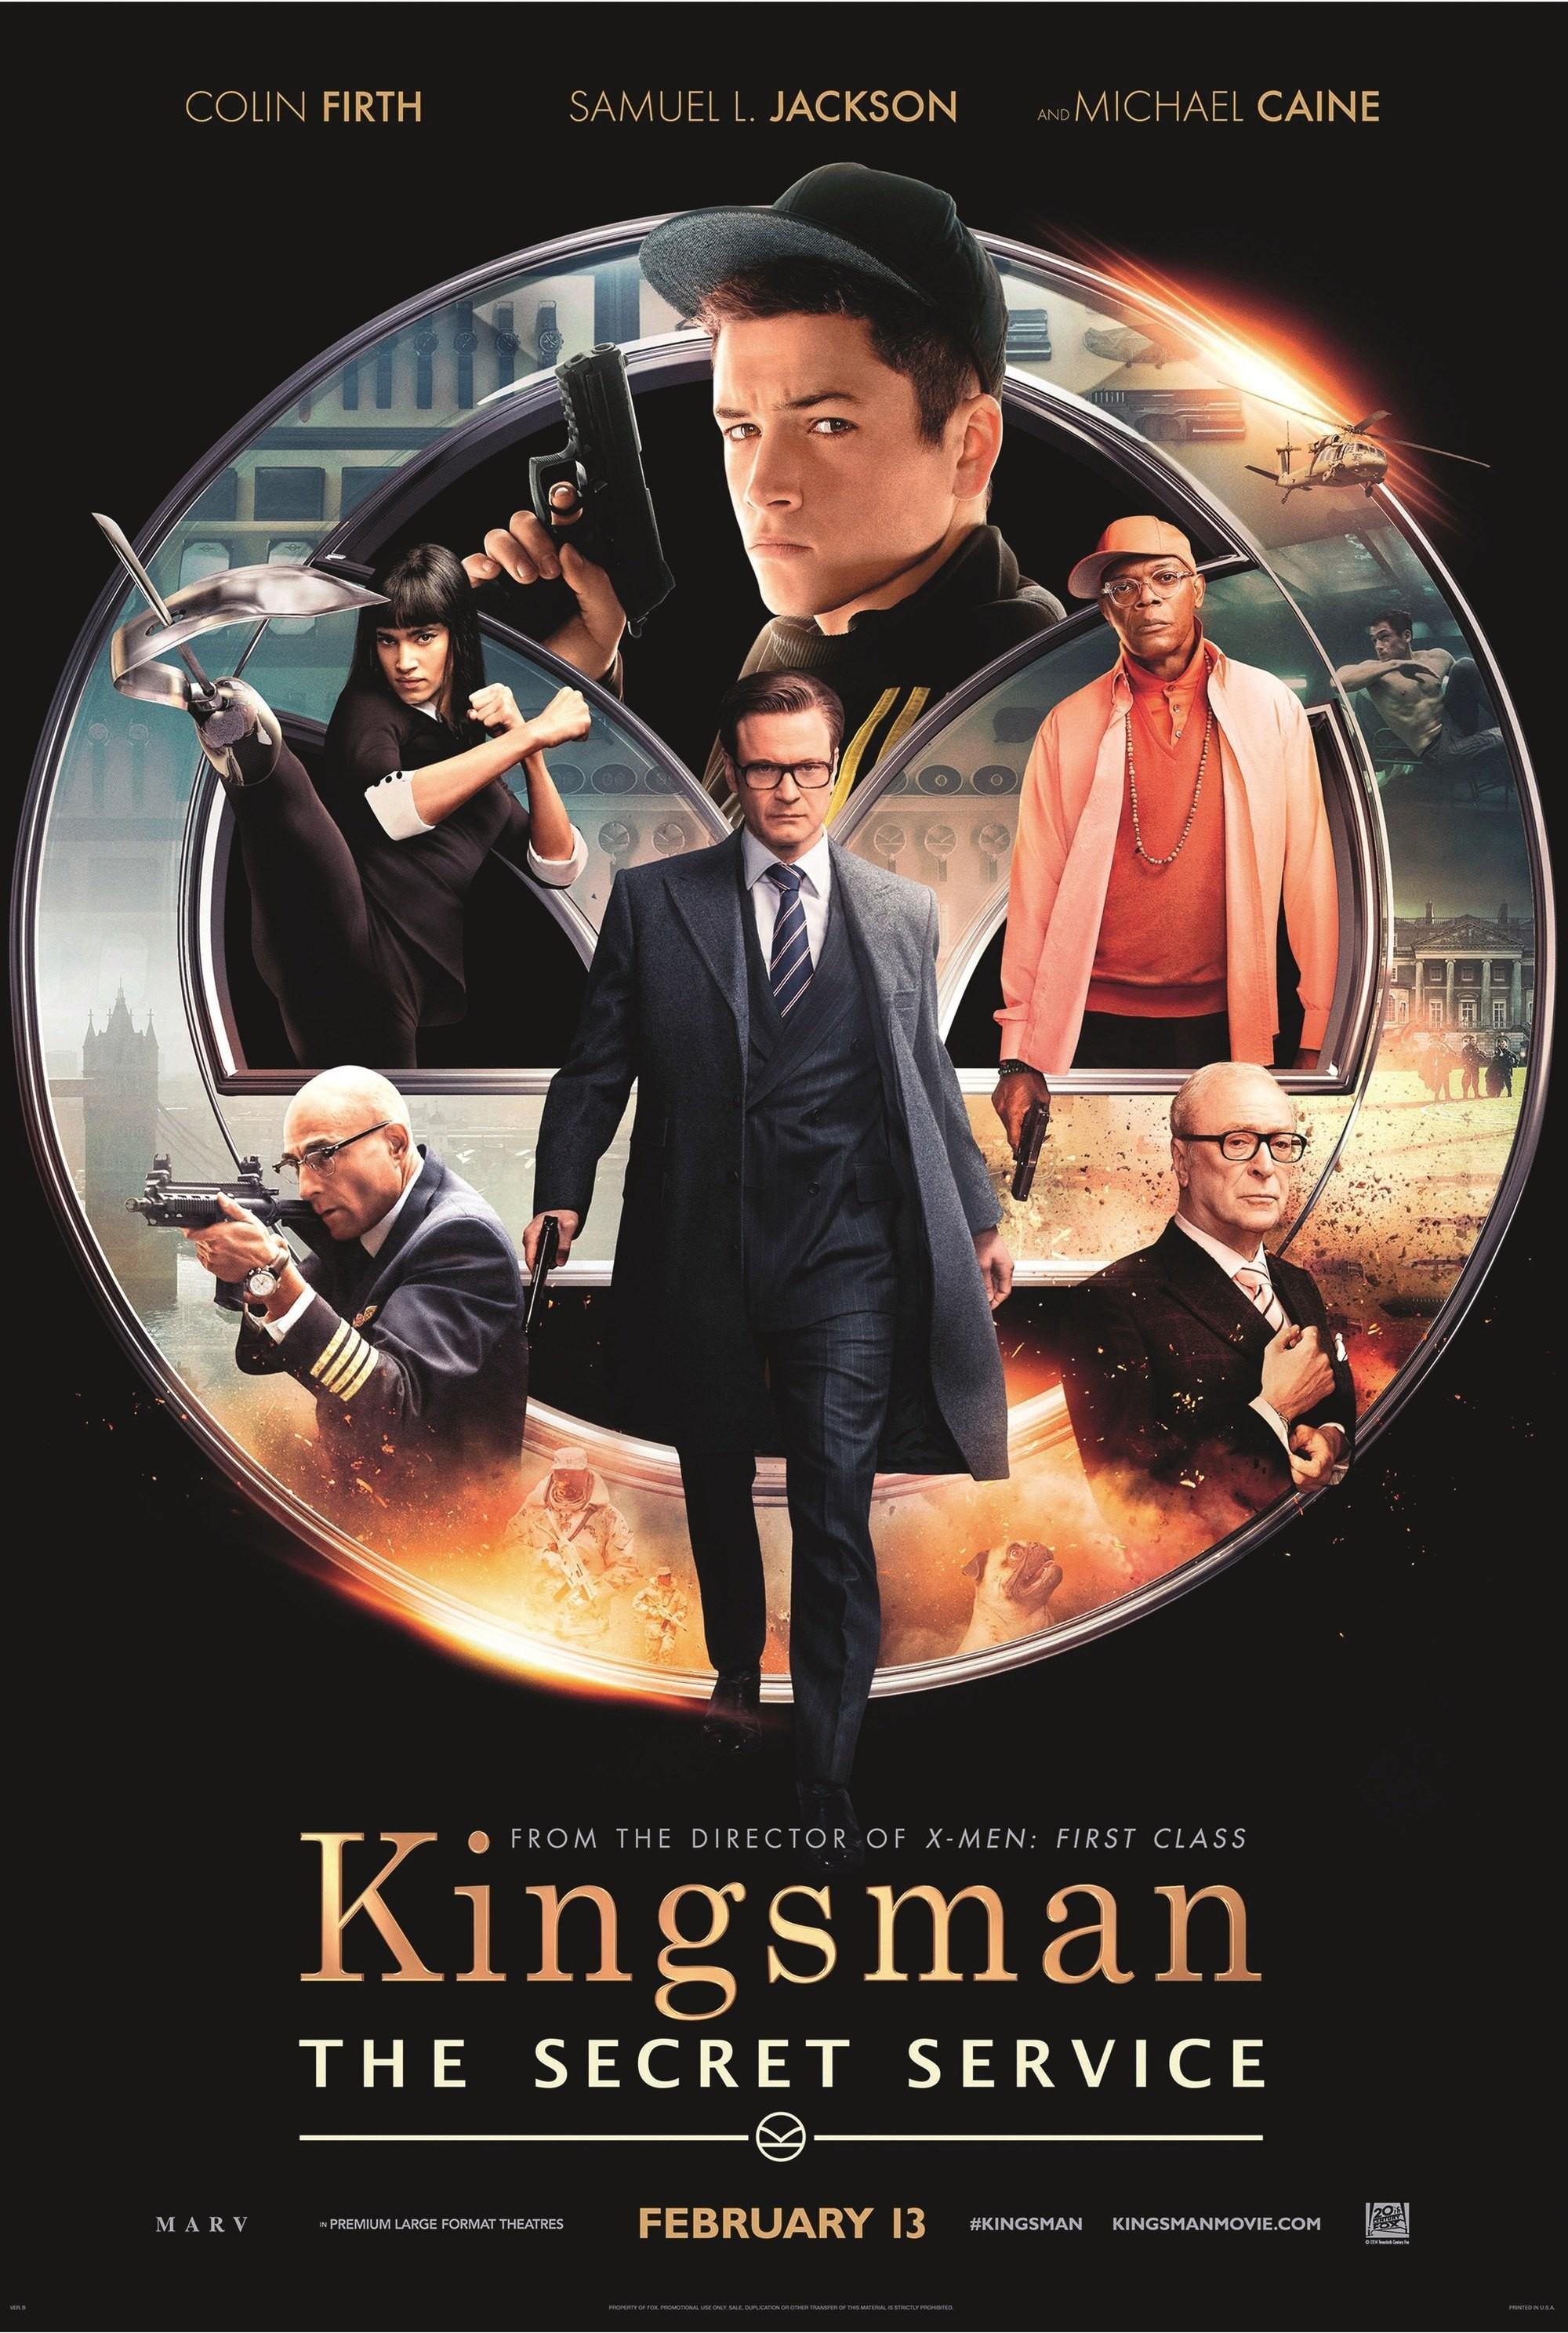 Kingsman: The Secret Service, by Matthew Vaughn, 2015.